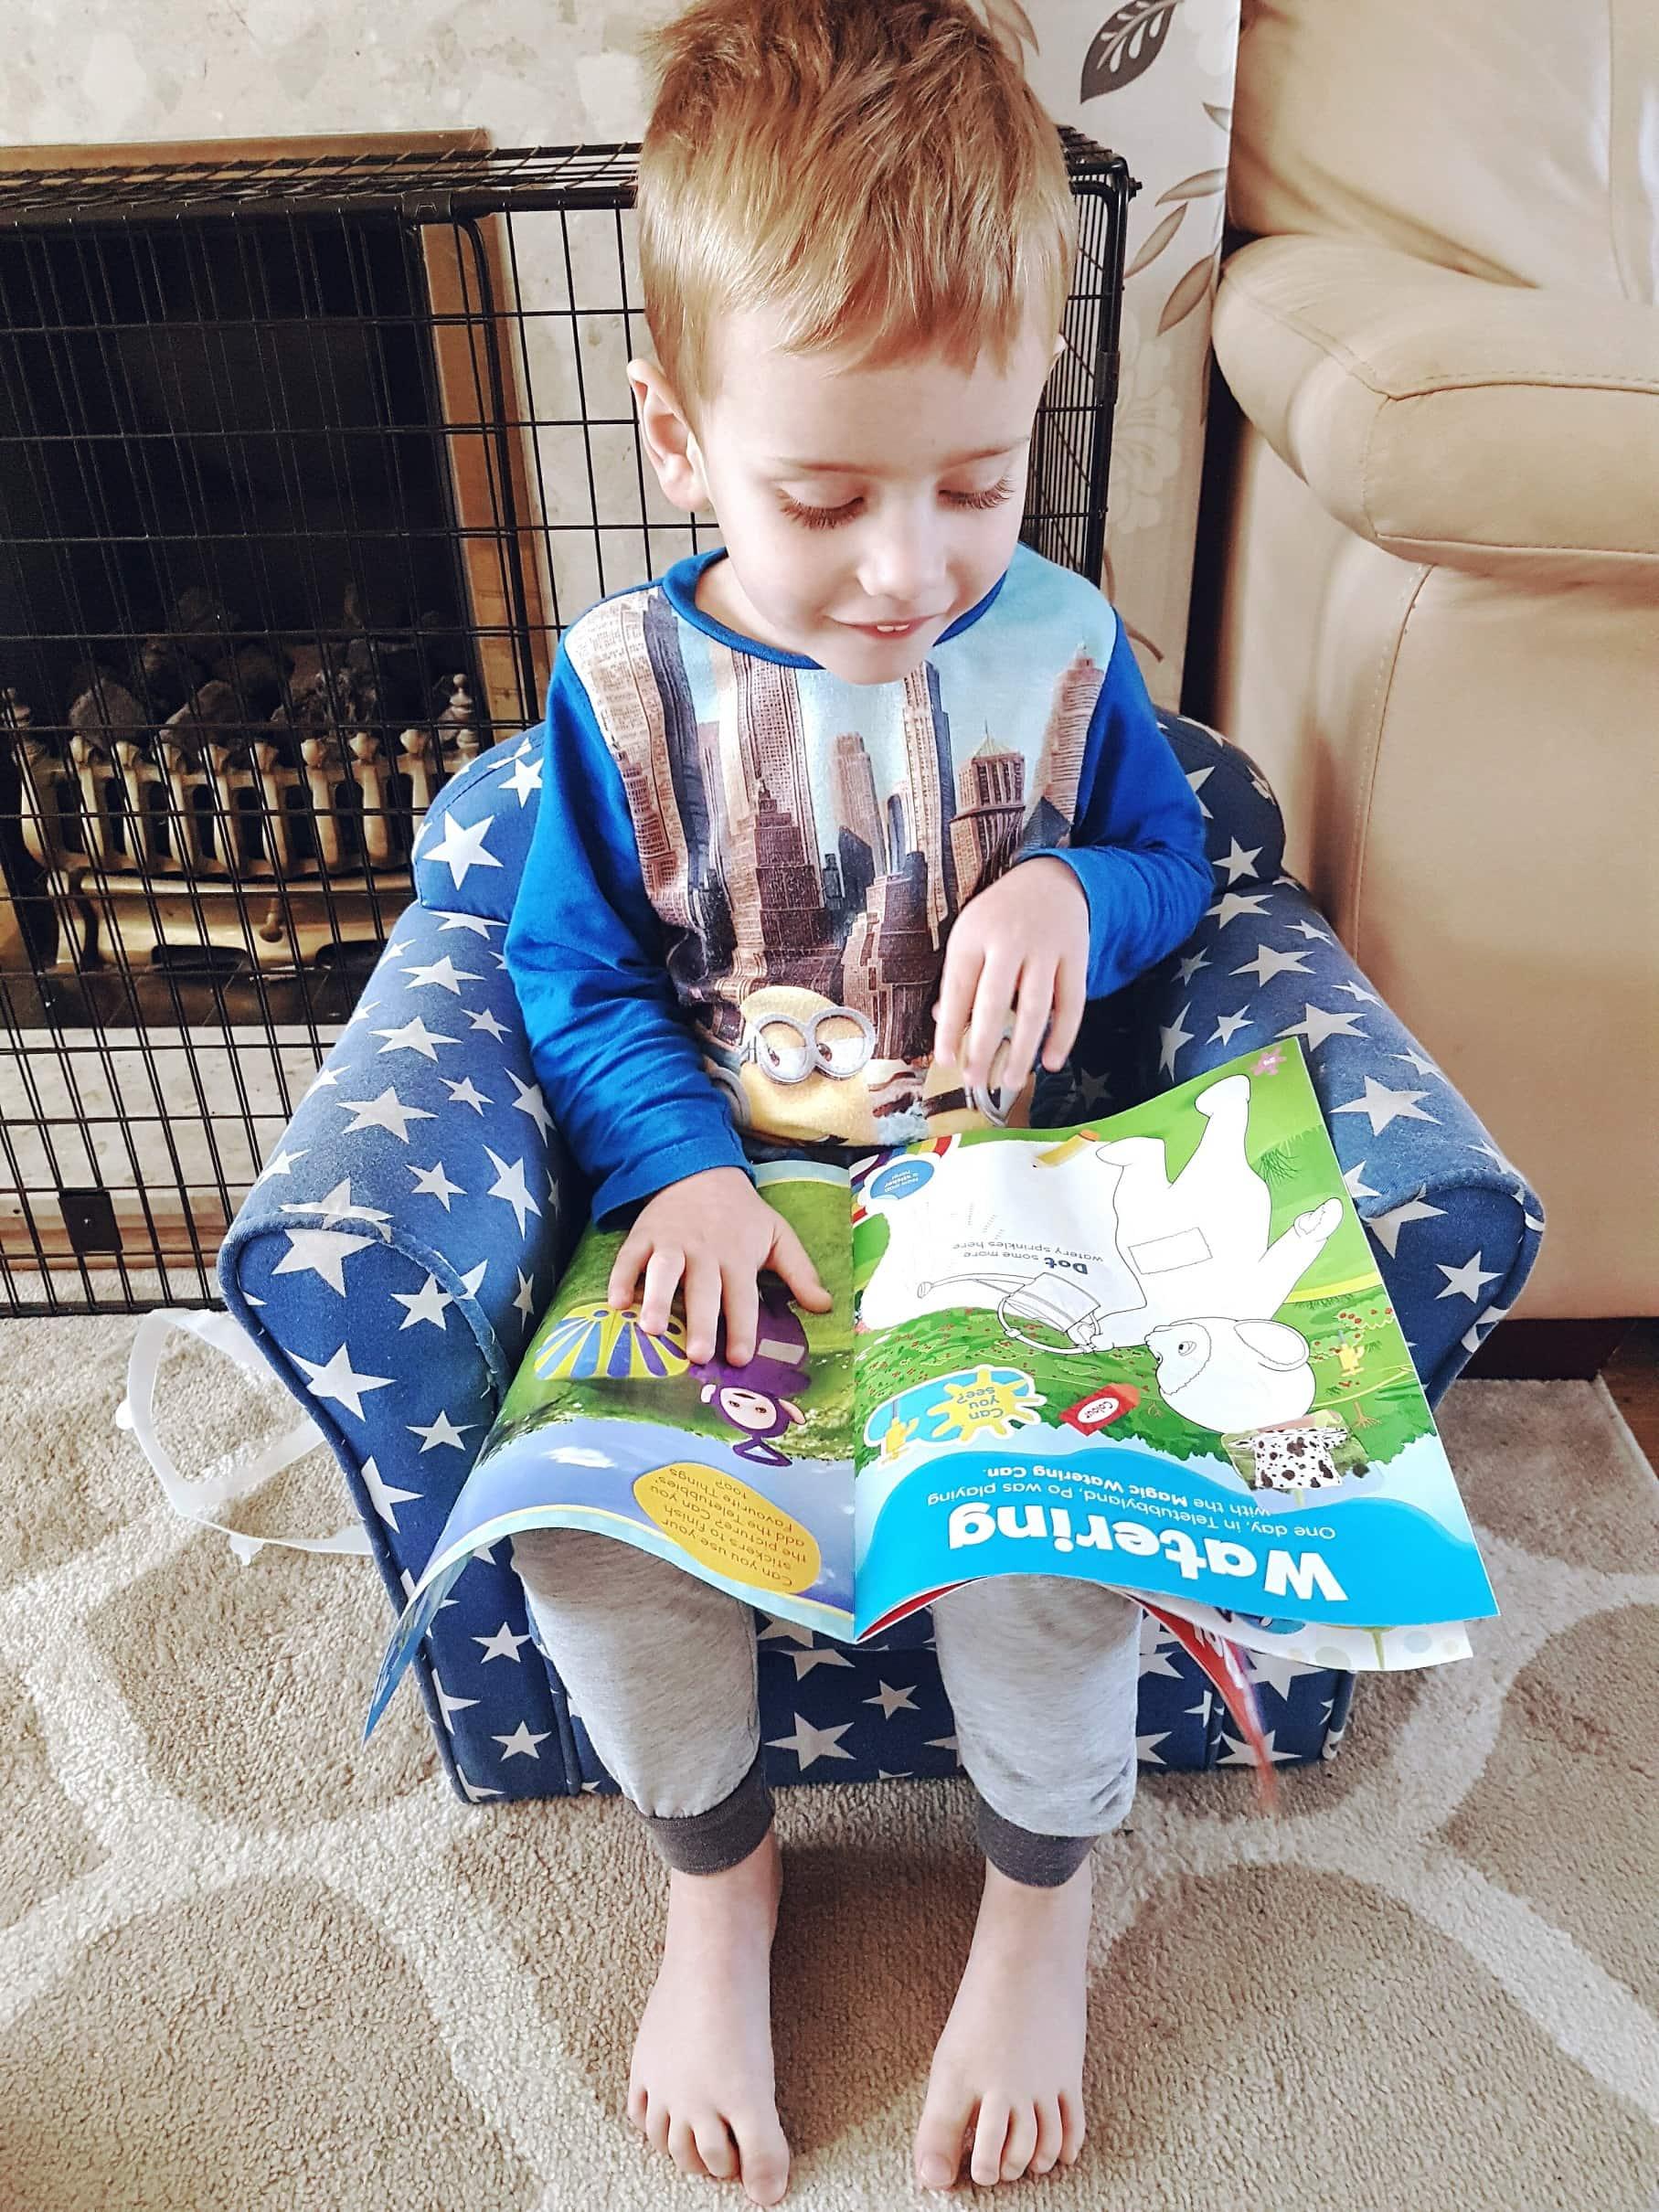 Boy reading Teletubbies magazine by Somoene's Mum